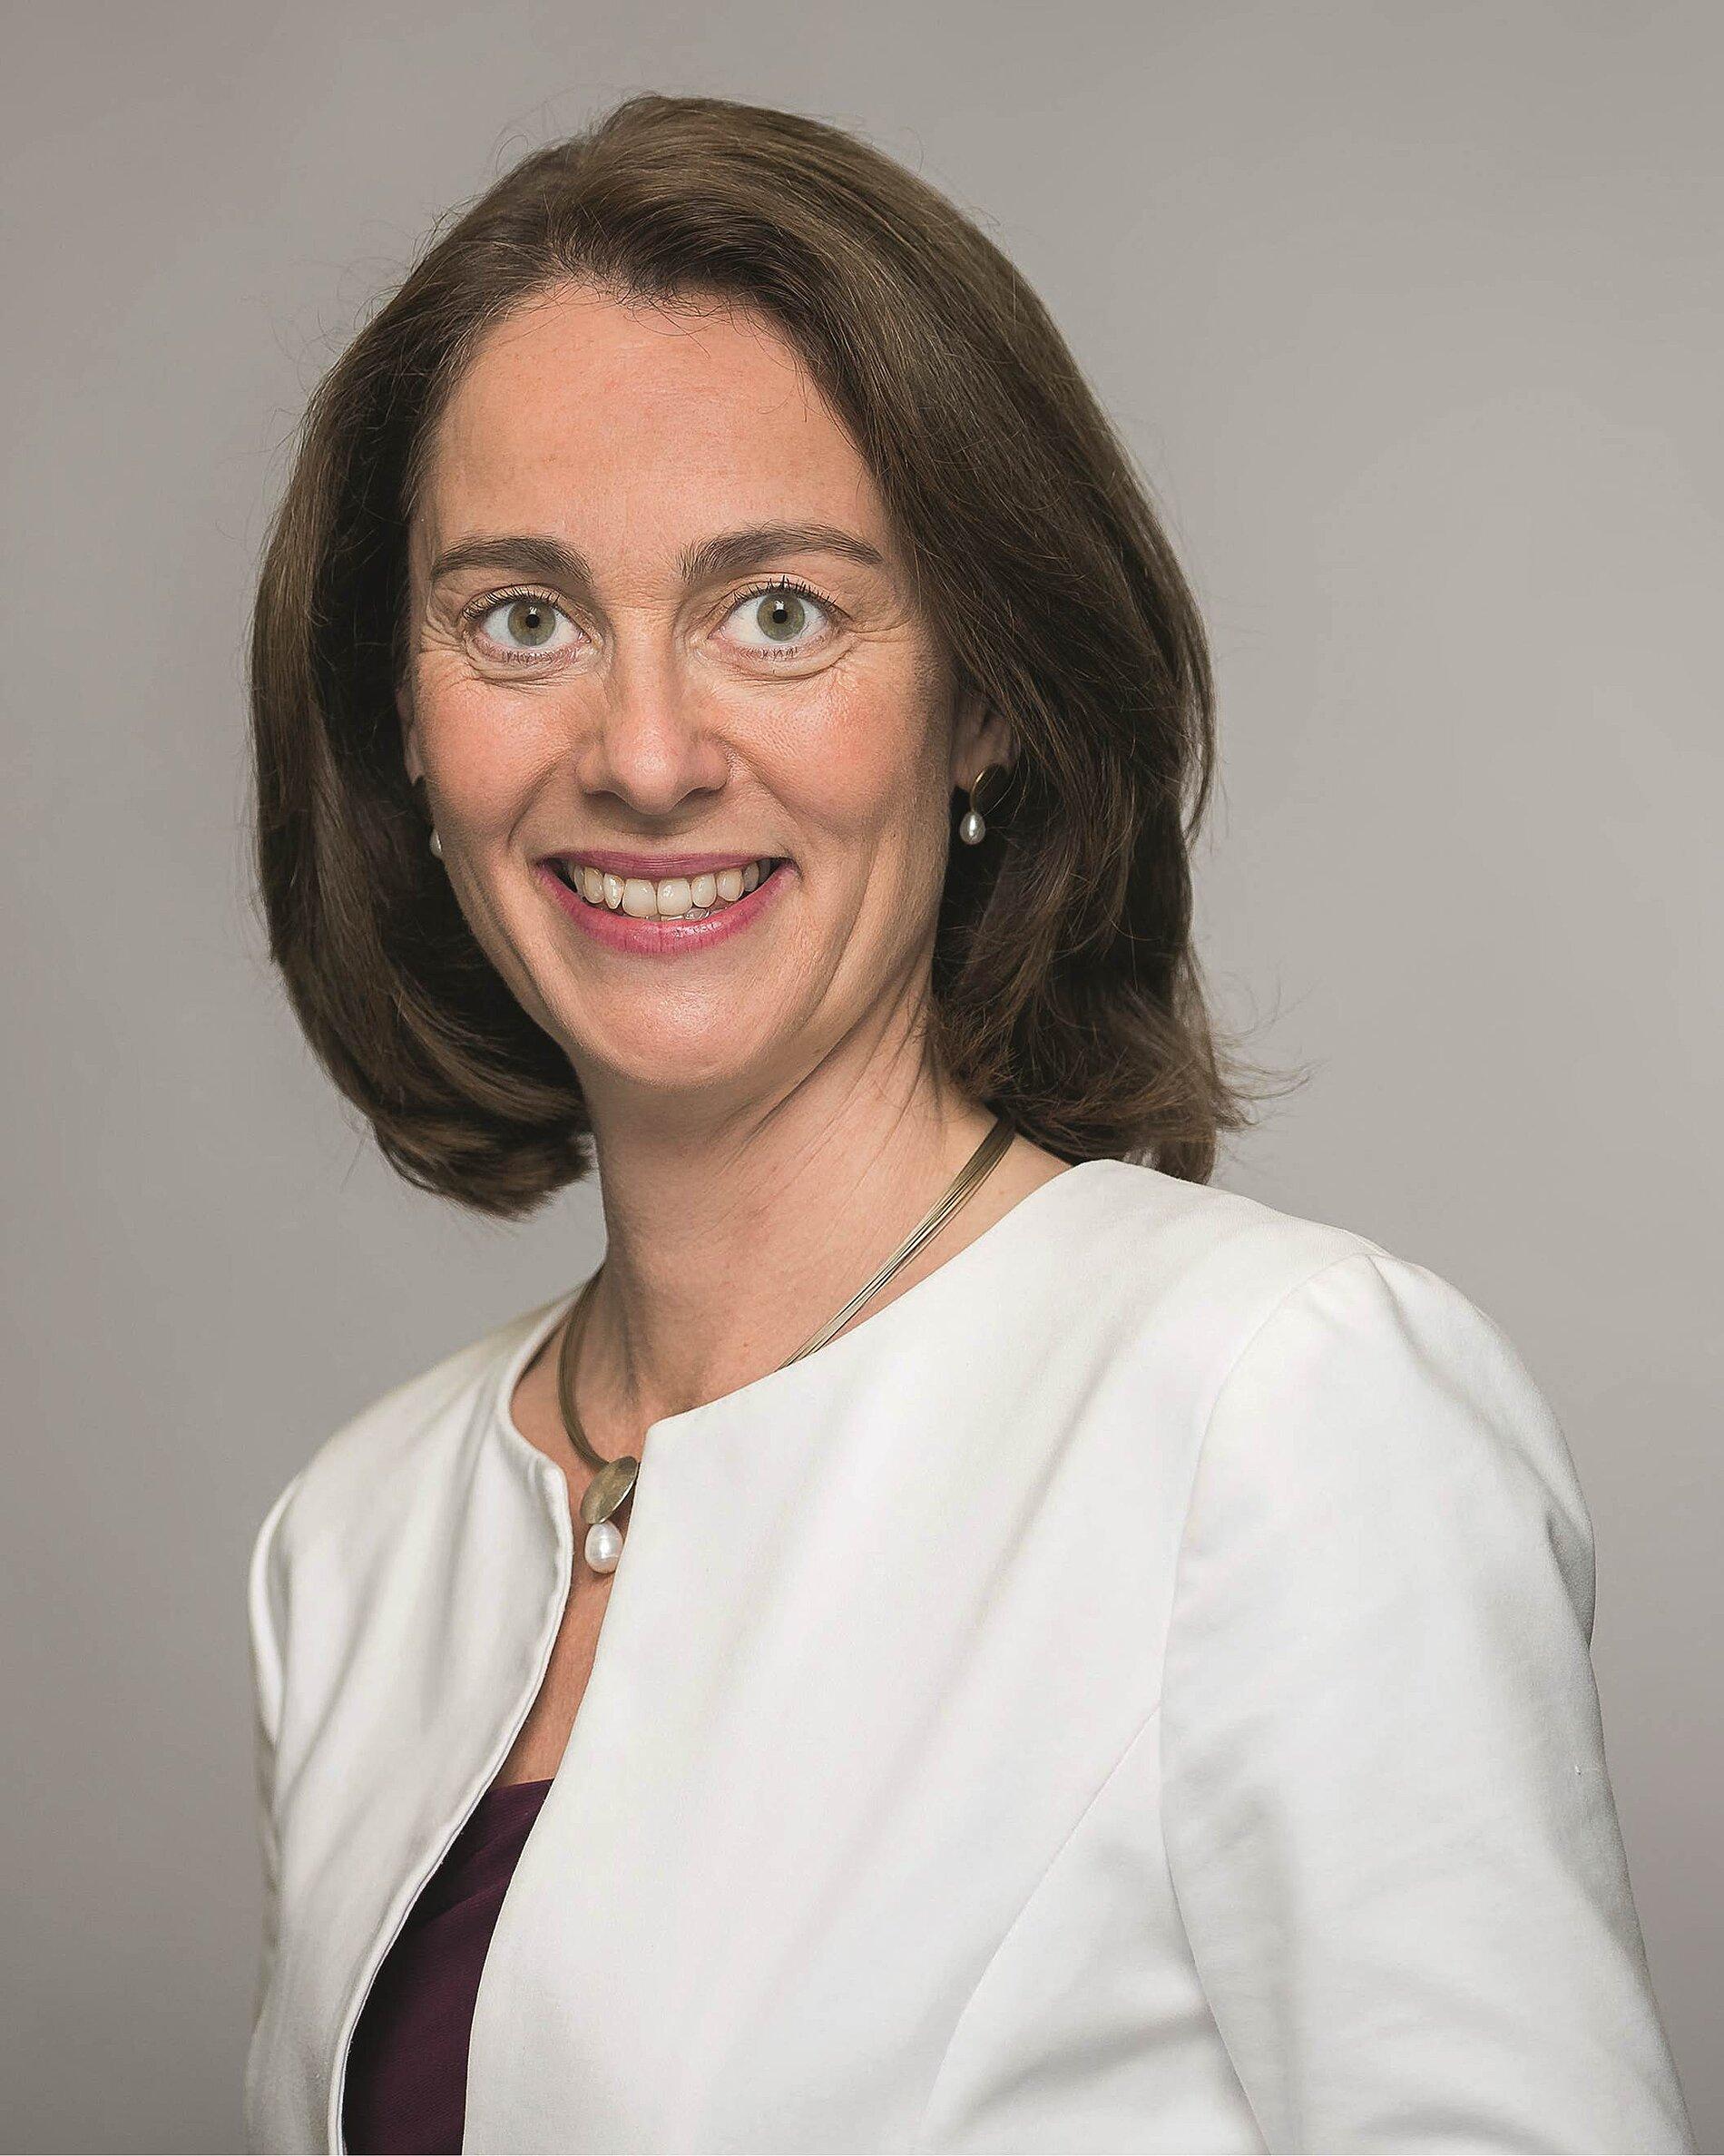 Porträtfoto der Bundesfamilienministerin Katarina Barley.